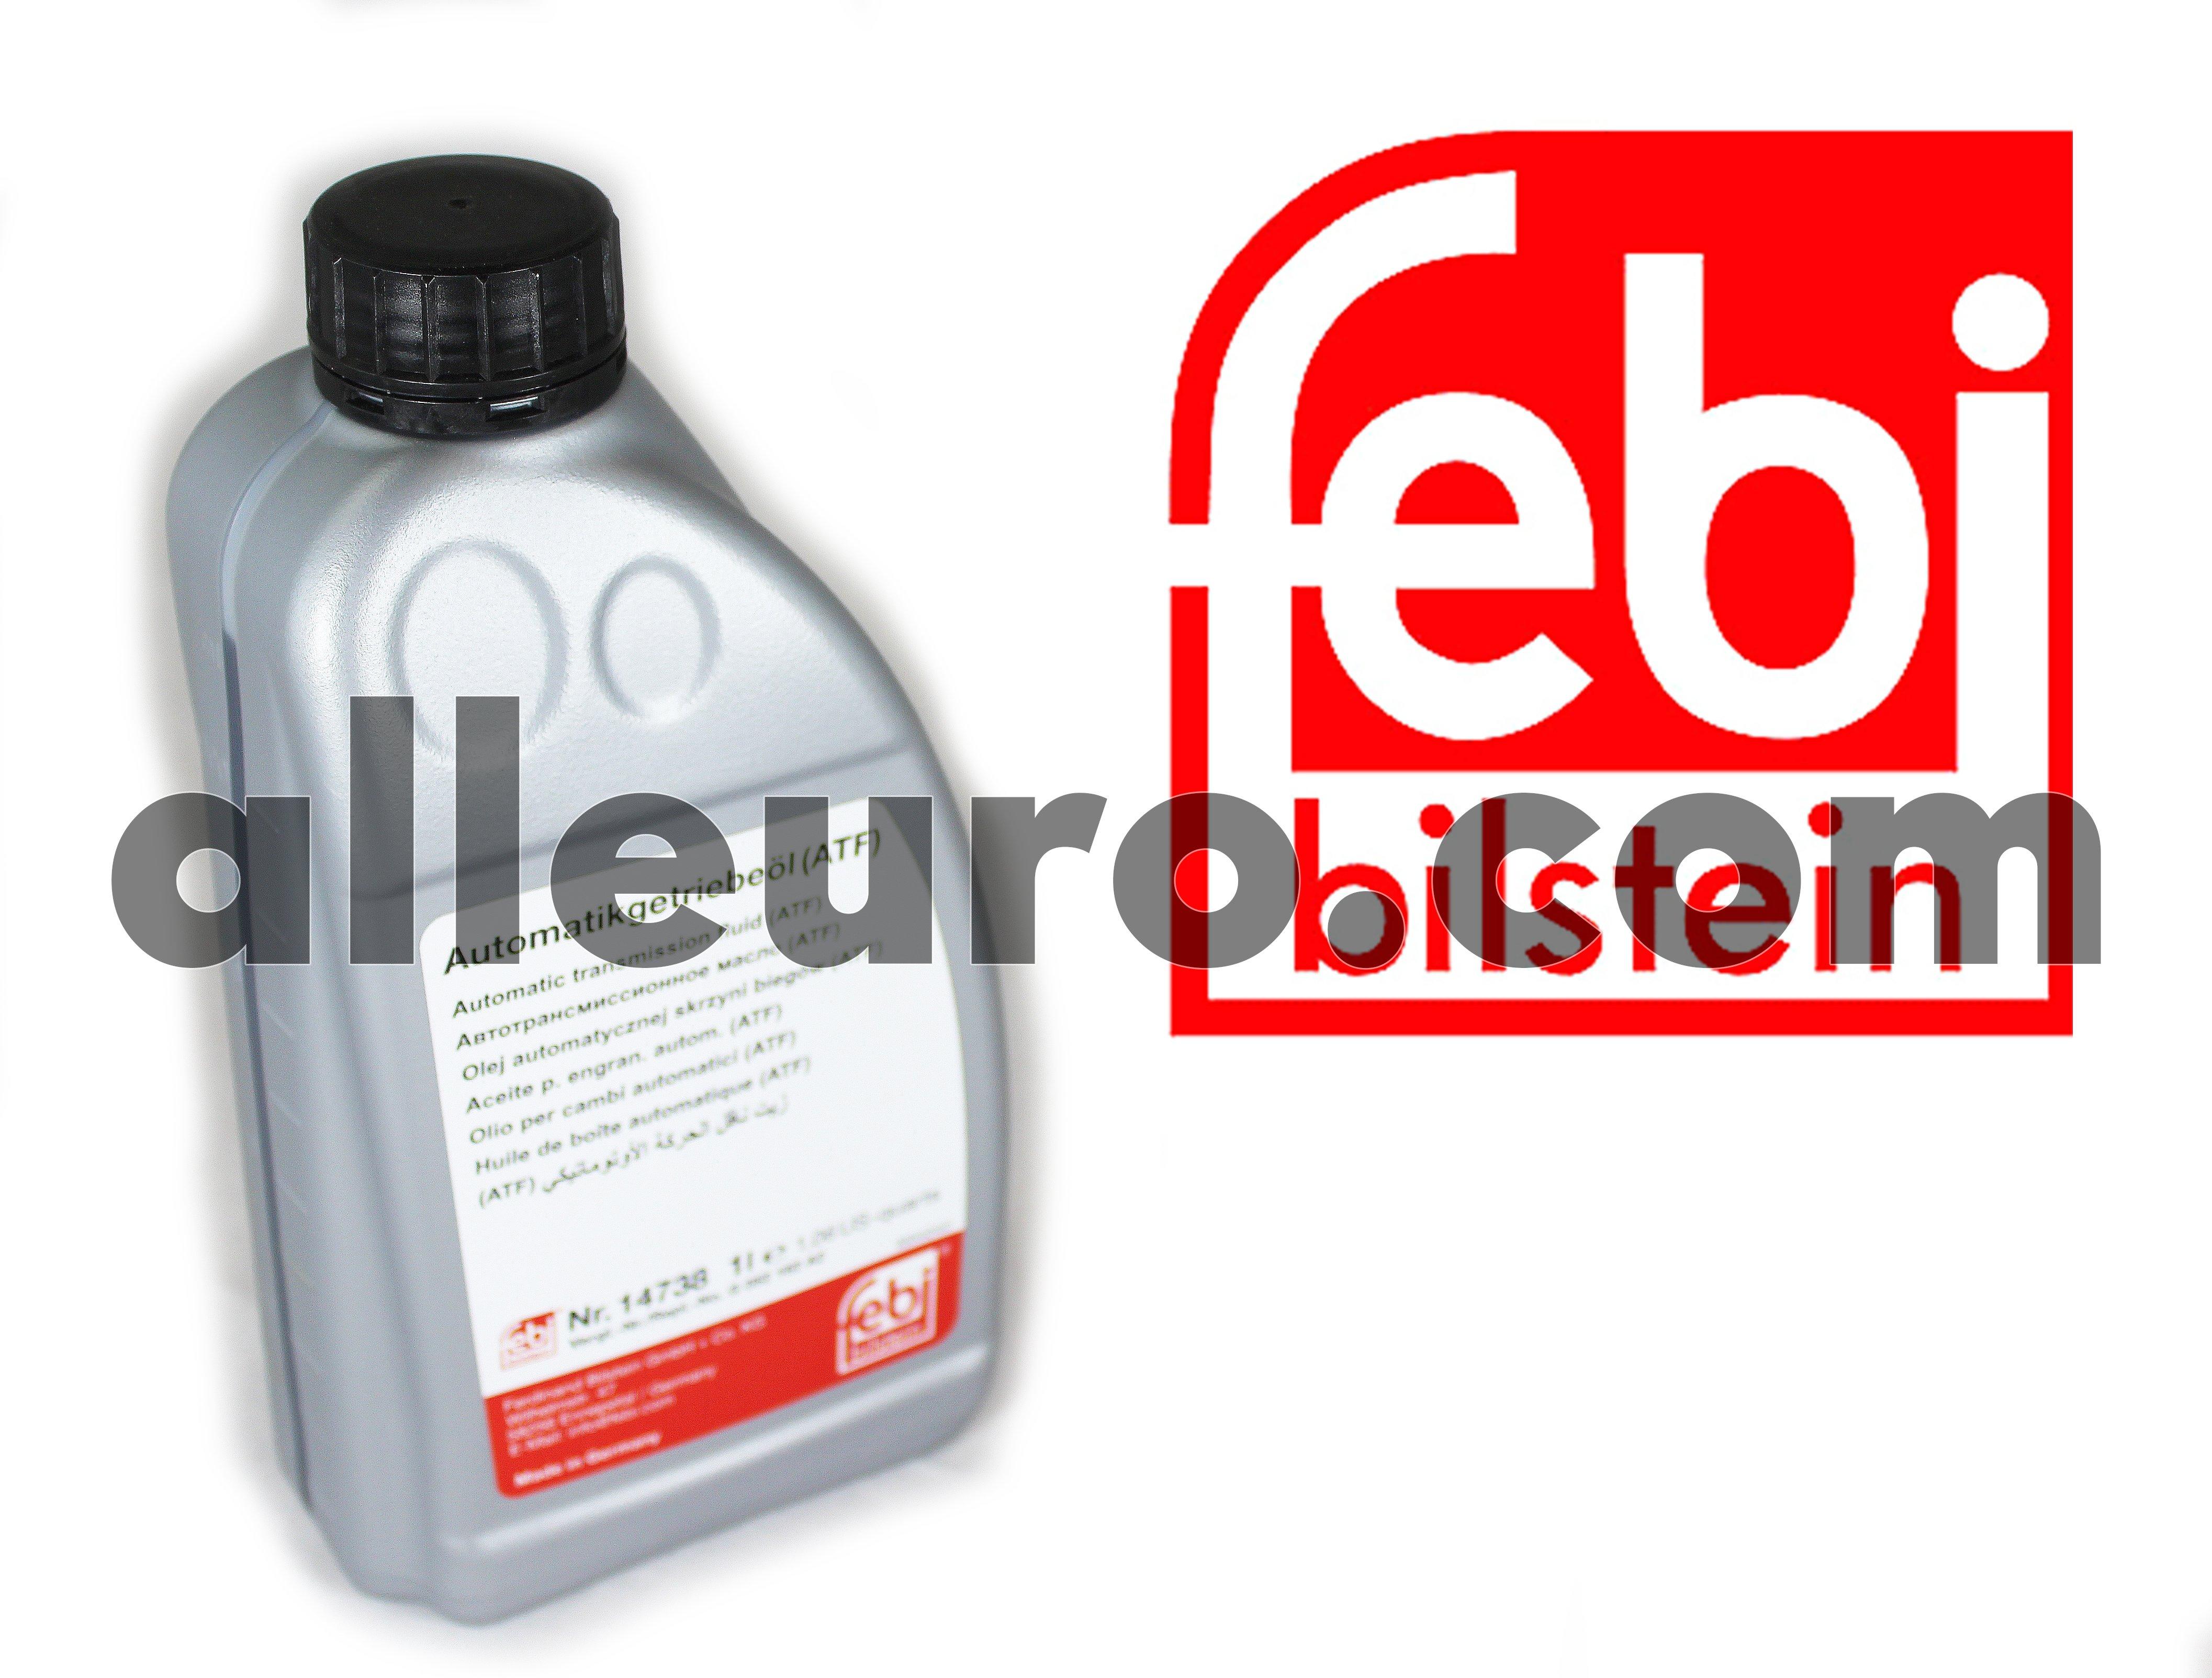 Febi Bilstein Automatic Transmission Fluid 1 Liter 14738 14738